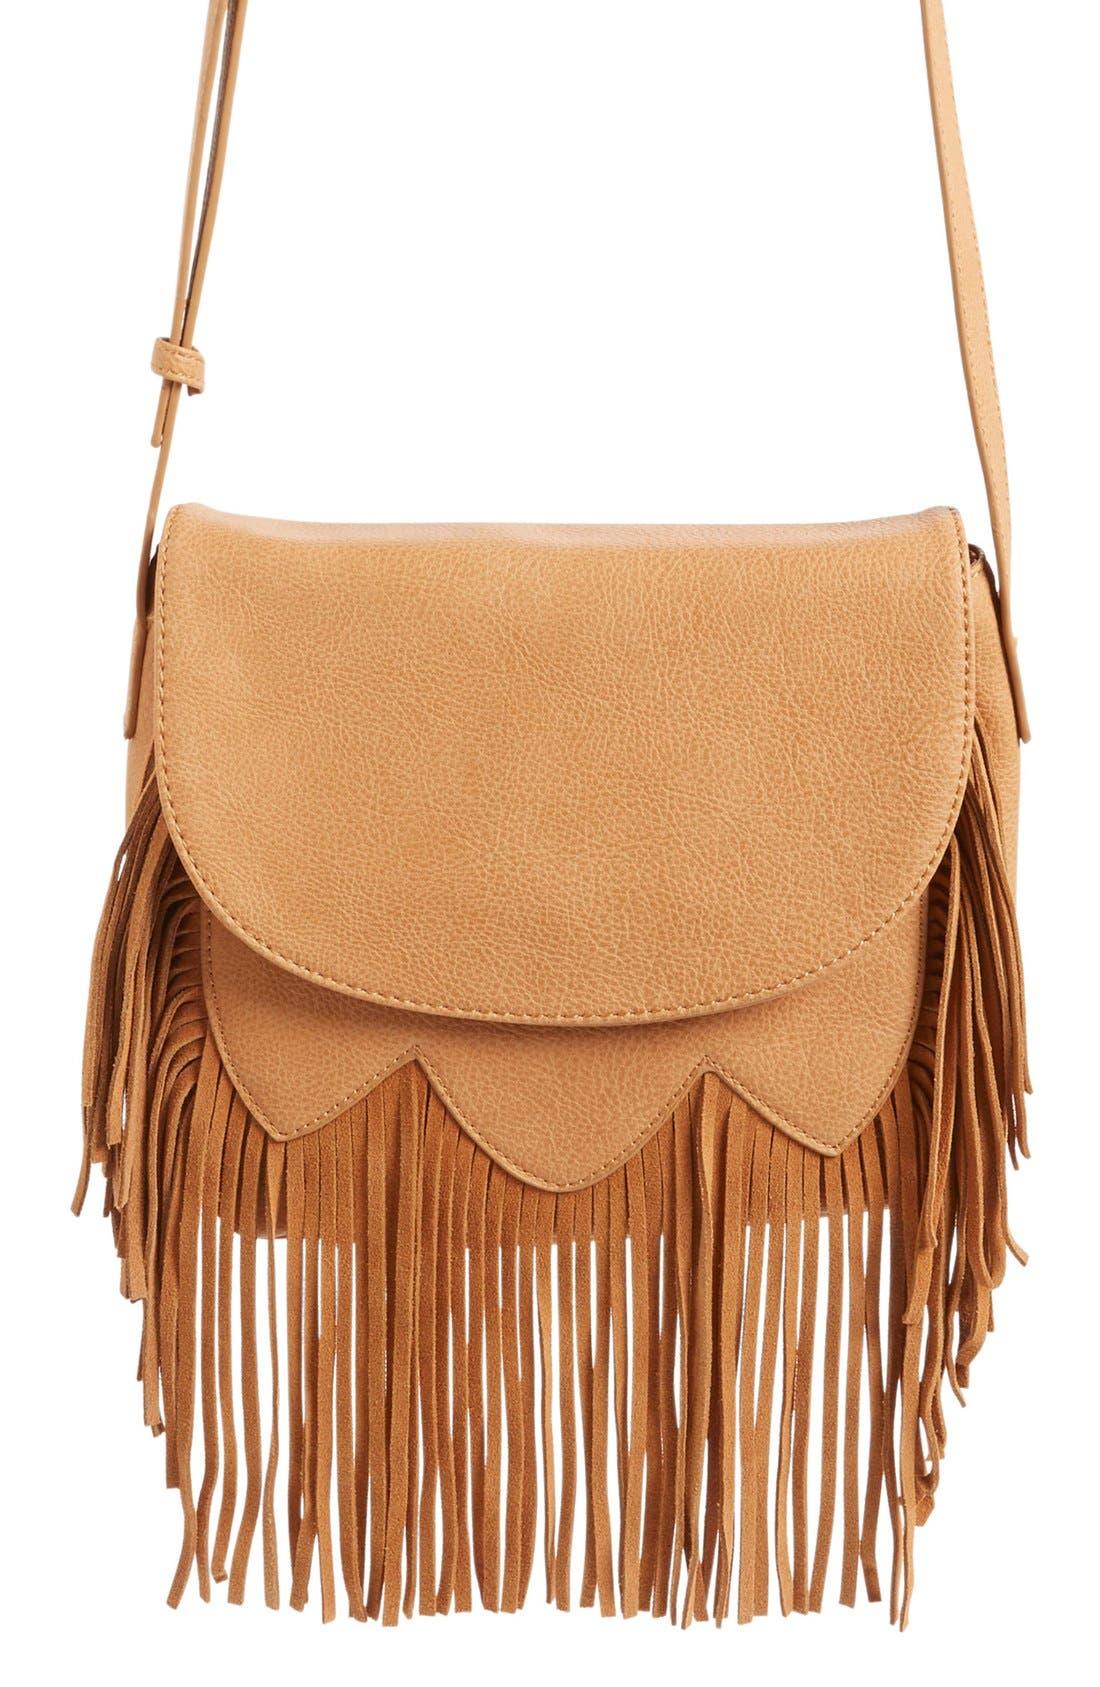 Alternate Image 1 Selected - Sole Society 'Kerry' Fringe Faux Leather Crossbody Bag